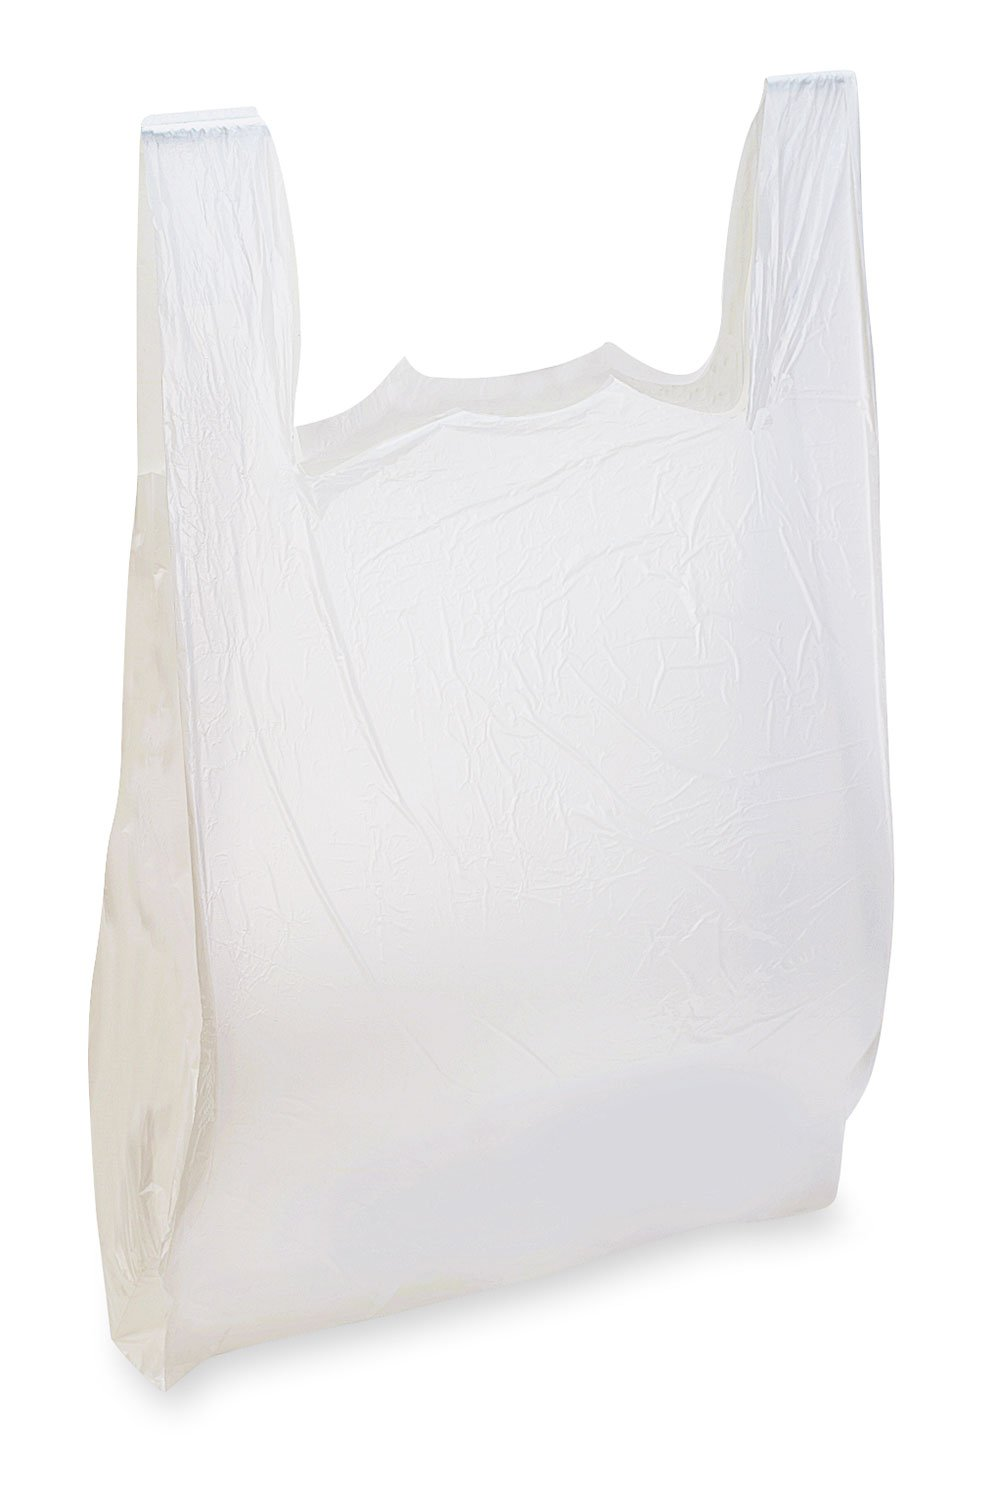 "T-Shirt Bags HDPE - 12"" x 7"" x 21"" (1000/cs)"